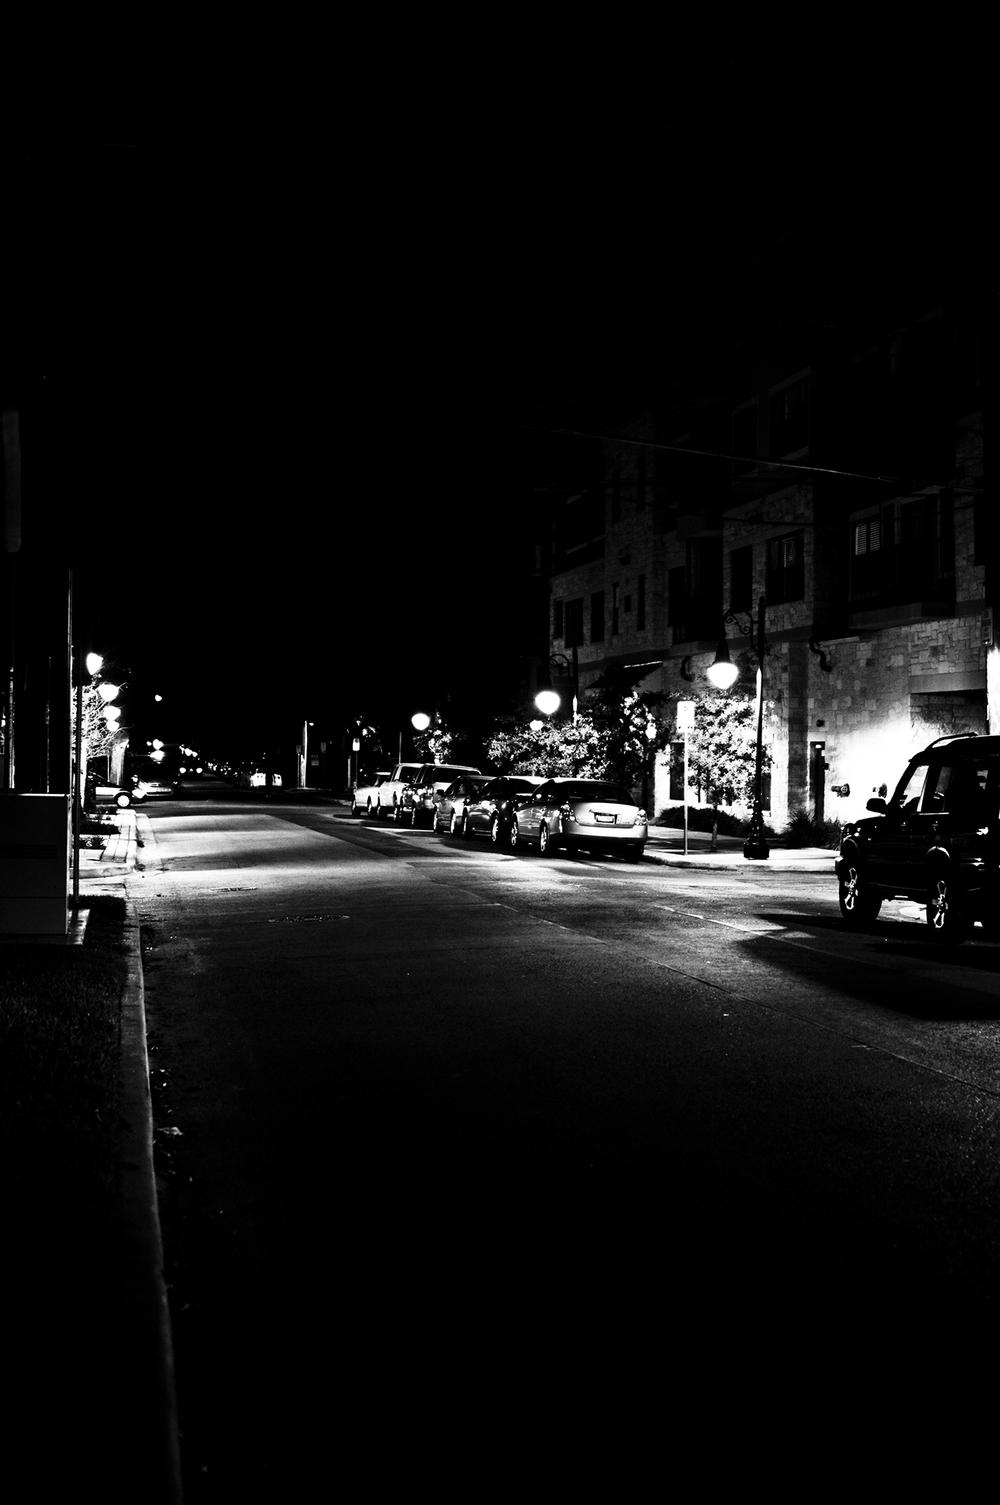 streets_5-finish.jpg